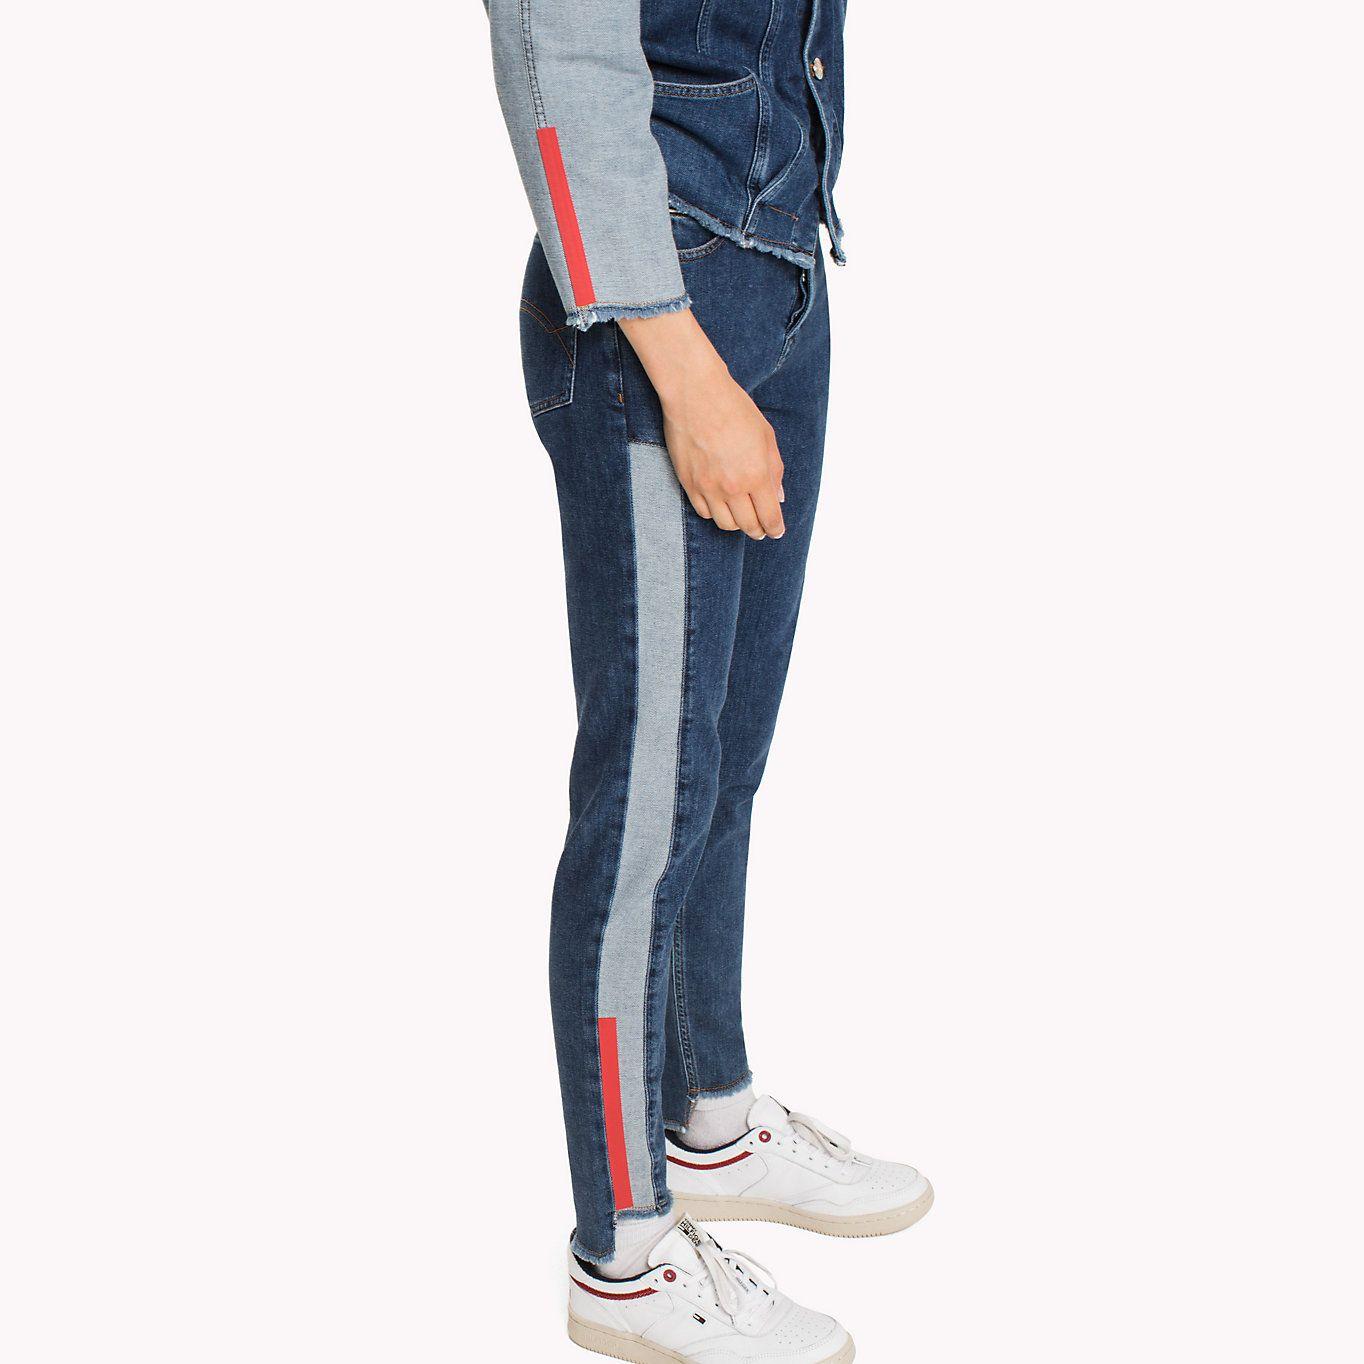 Tommy Hilfiger Jeans Broek Heren